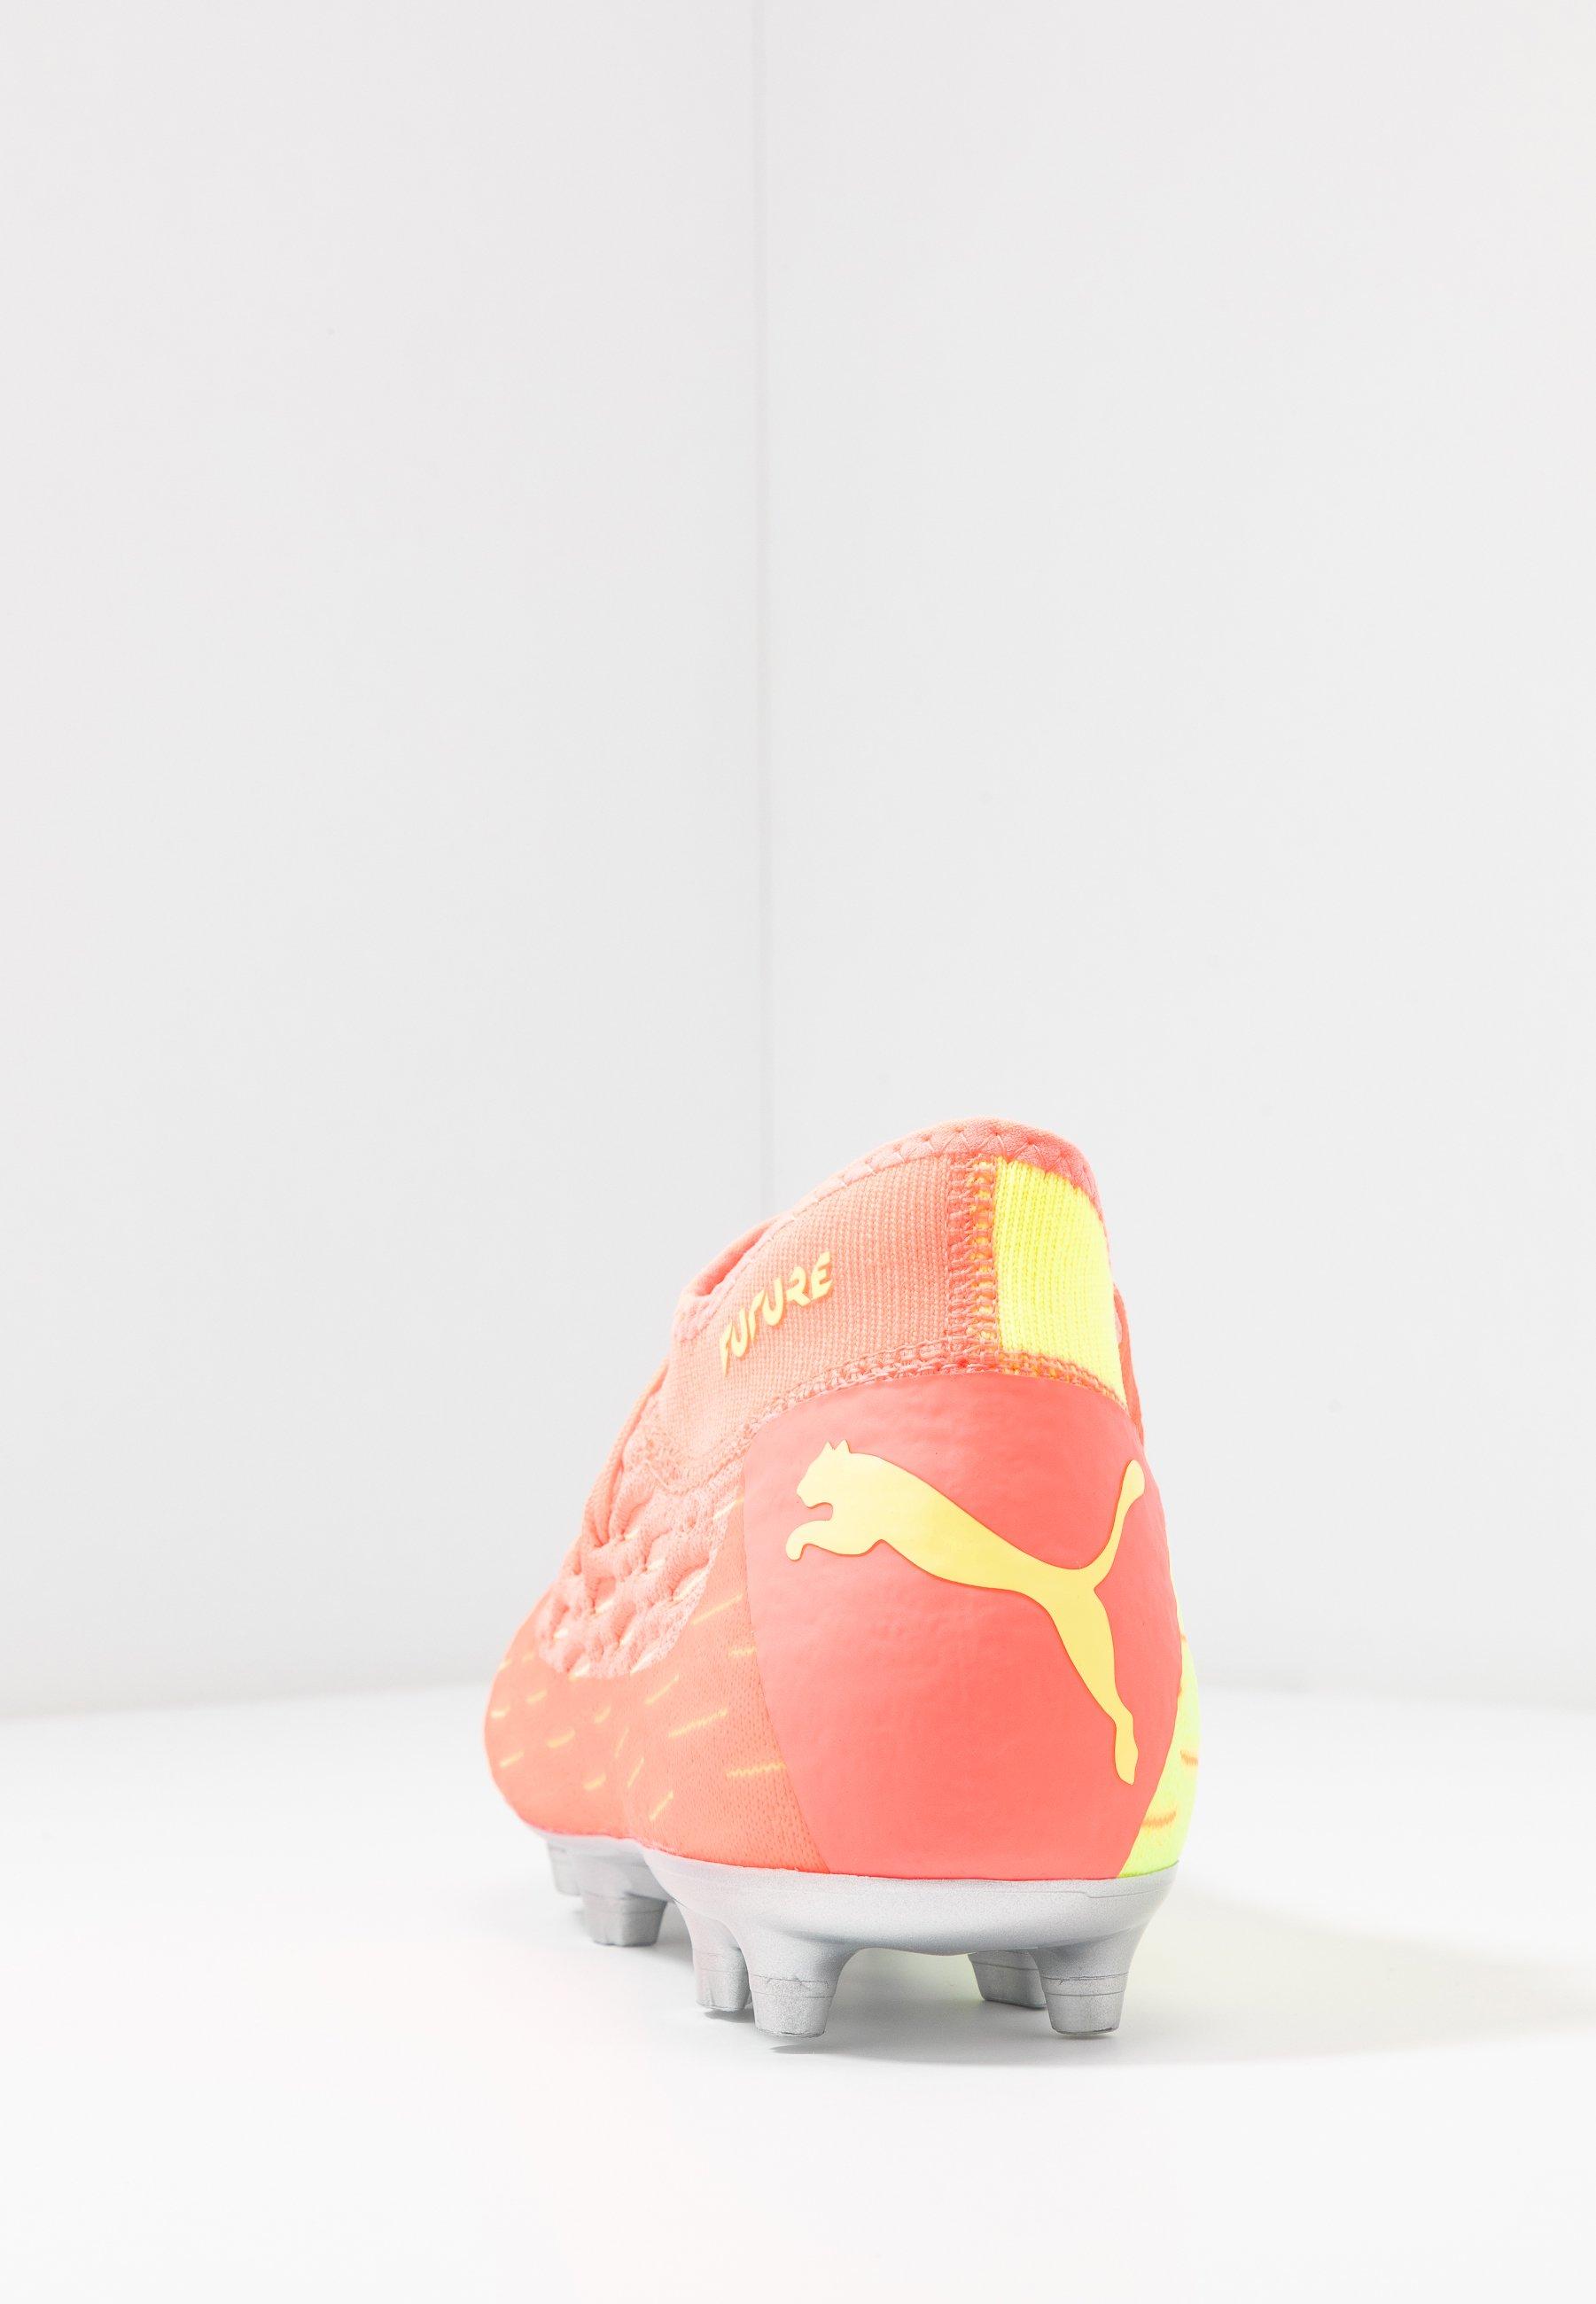 FUTURE 5.2 NETFIT OSG FGAG Fotbollsskor fasta dobbar energy peachfizzy yellow